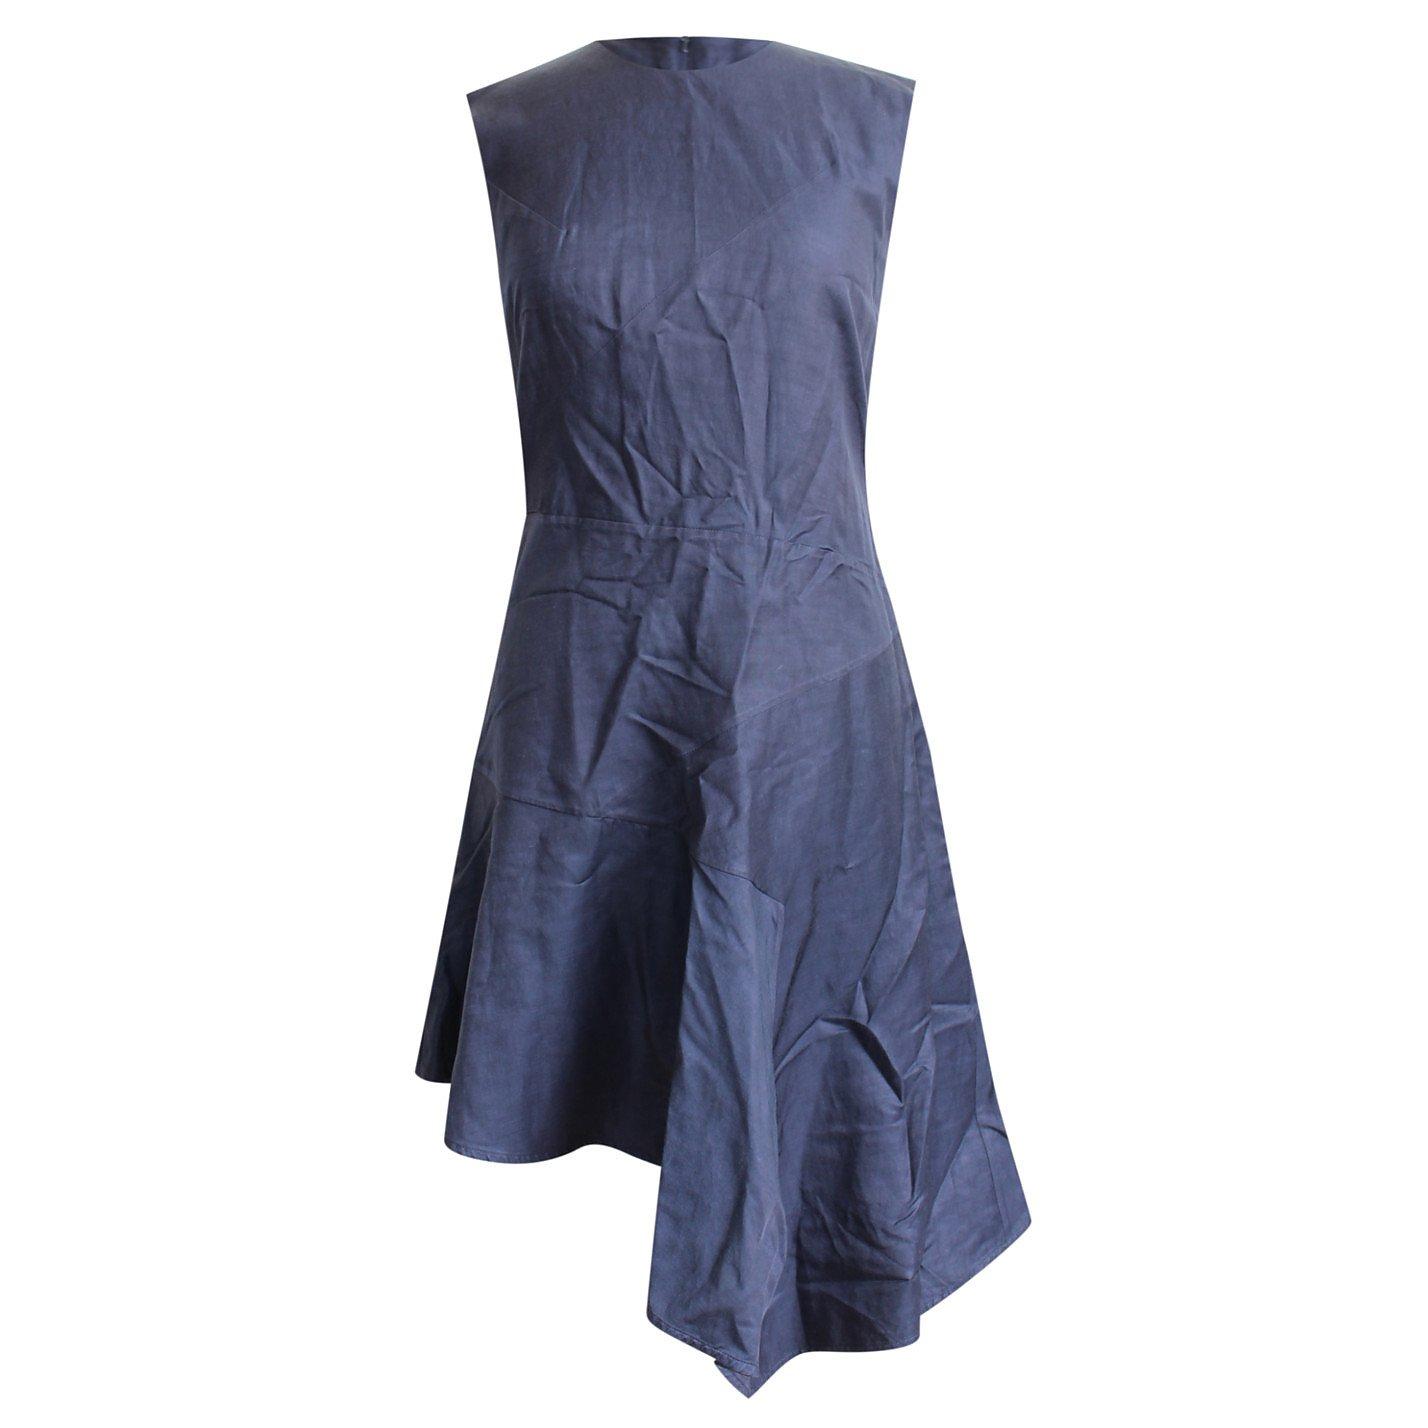 Eudon Choi Eudon Choi Assymetrical Hem Navy Summer Dress